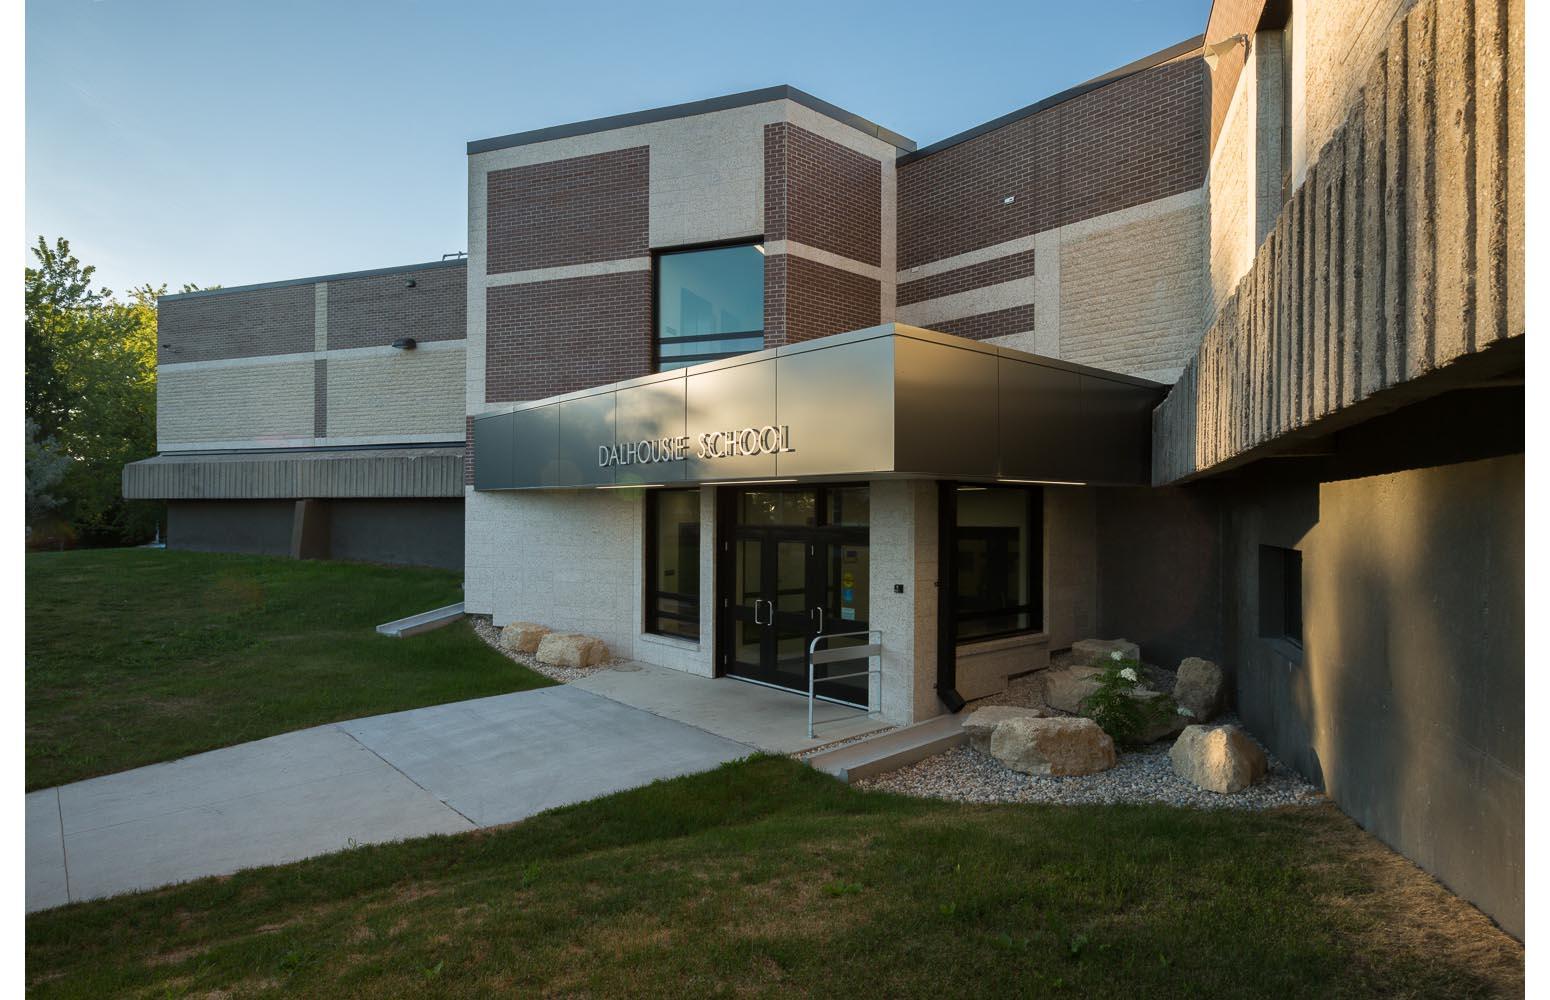 Dalhousie School Elevator Addition, exterior photo of the building / Photo:  Lindsay Reid